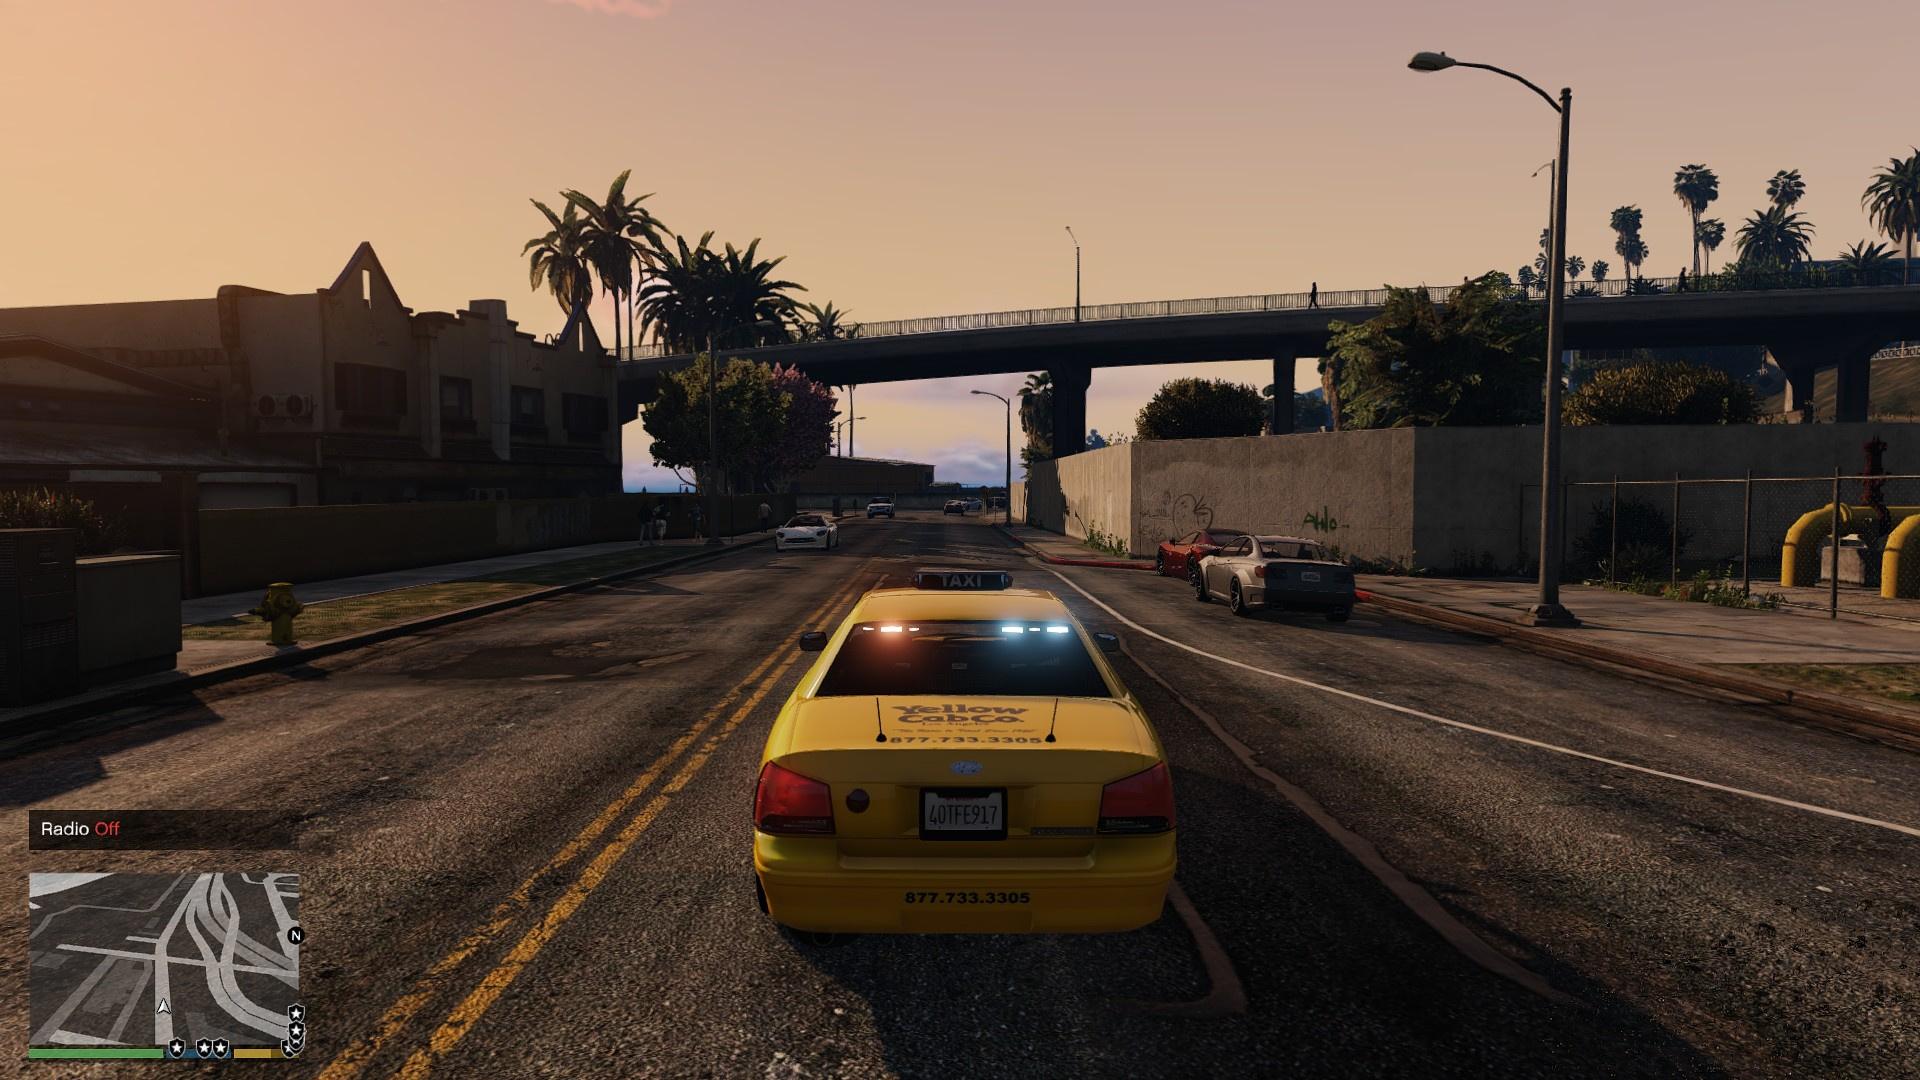 Unmarked police car gta 5 - 99cc30 Gta5 2015 08 29 17 44 28